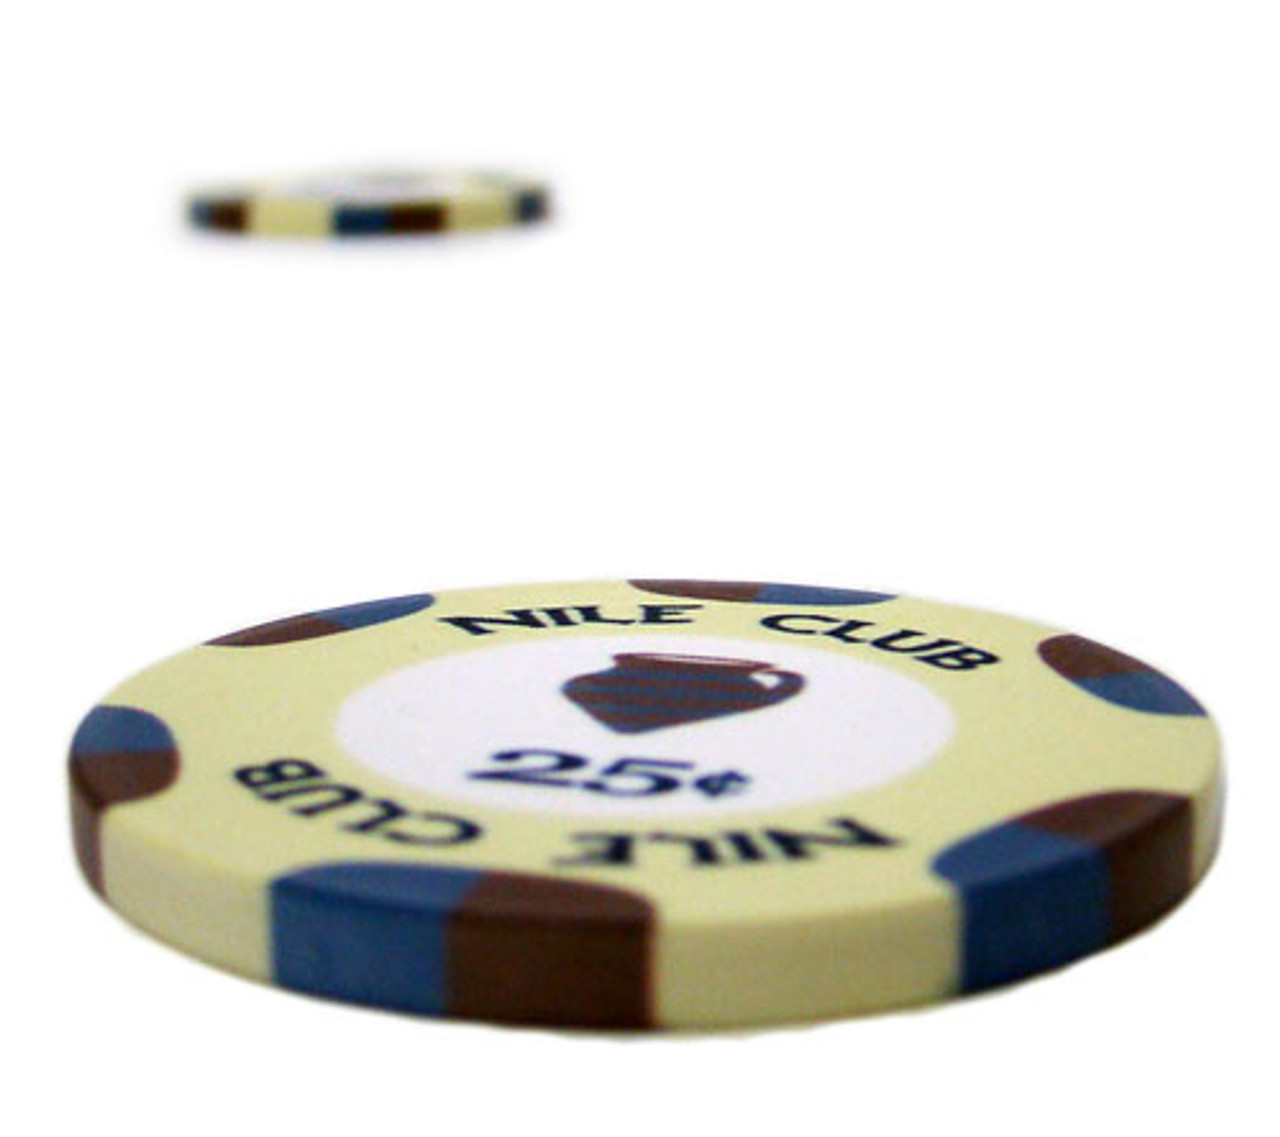 25 $10 Nile Club 10 Gram Ceramic Casino Quality Poker Chips